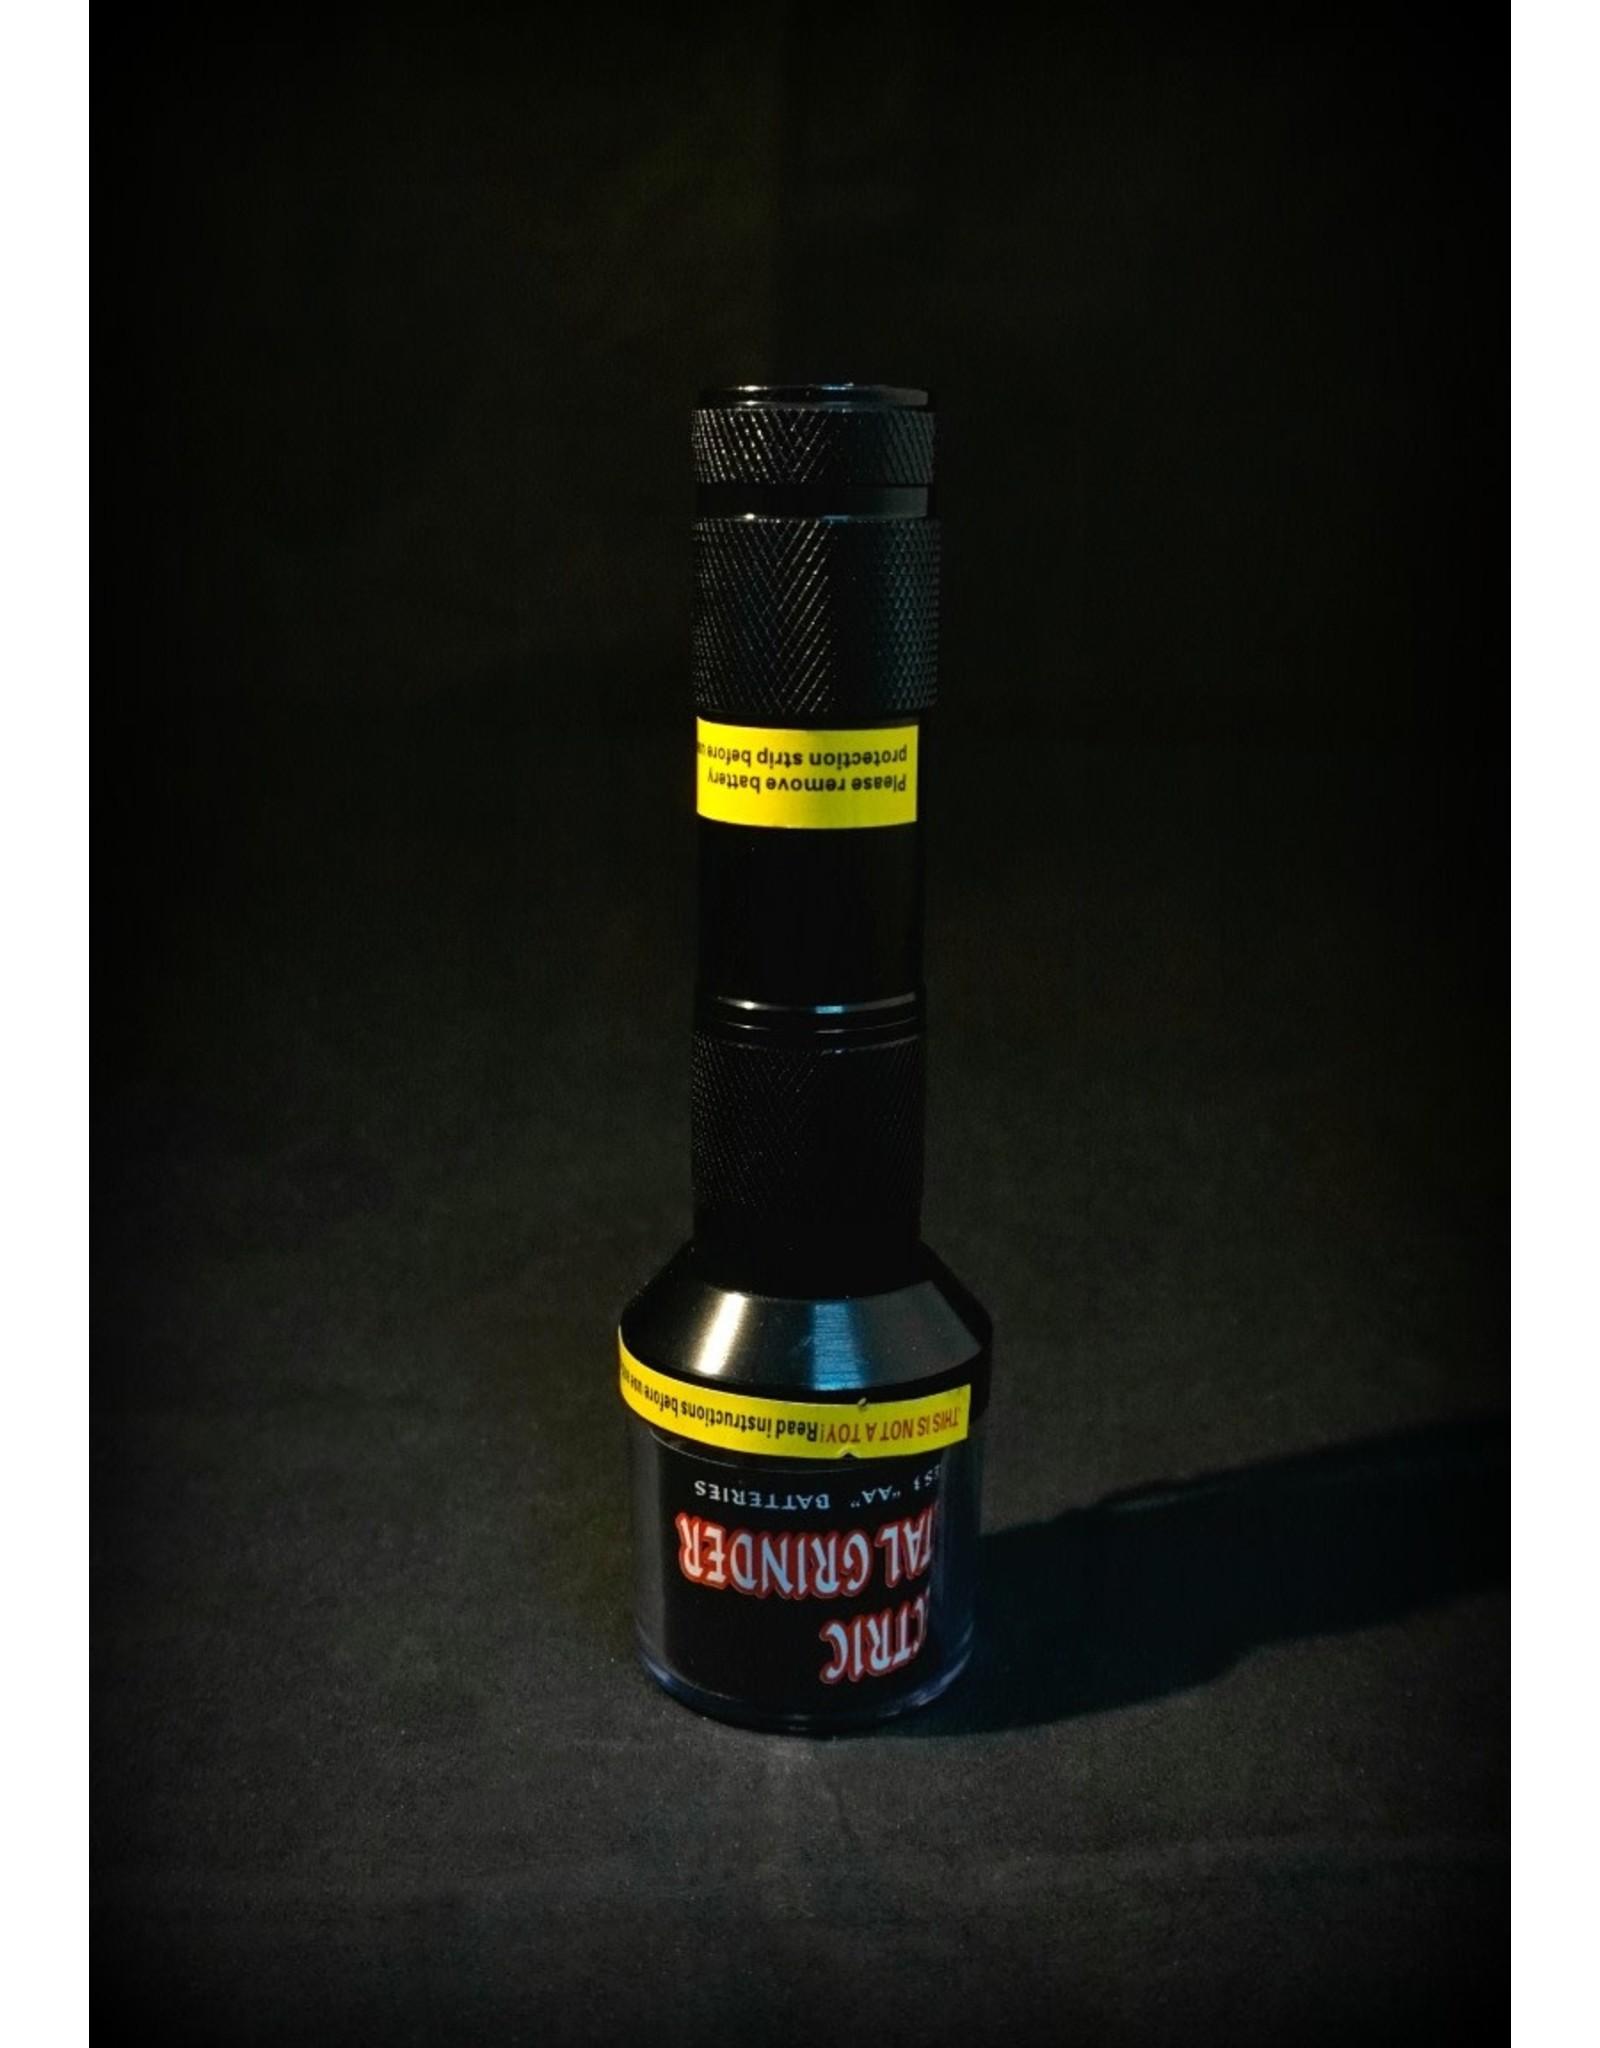 Electric Handheld Grinder - Black